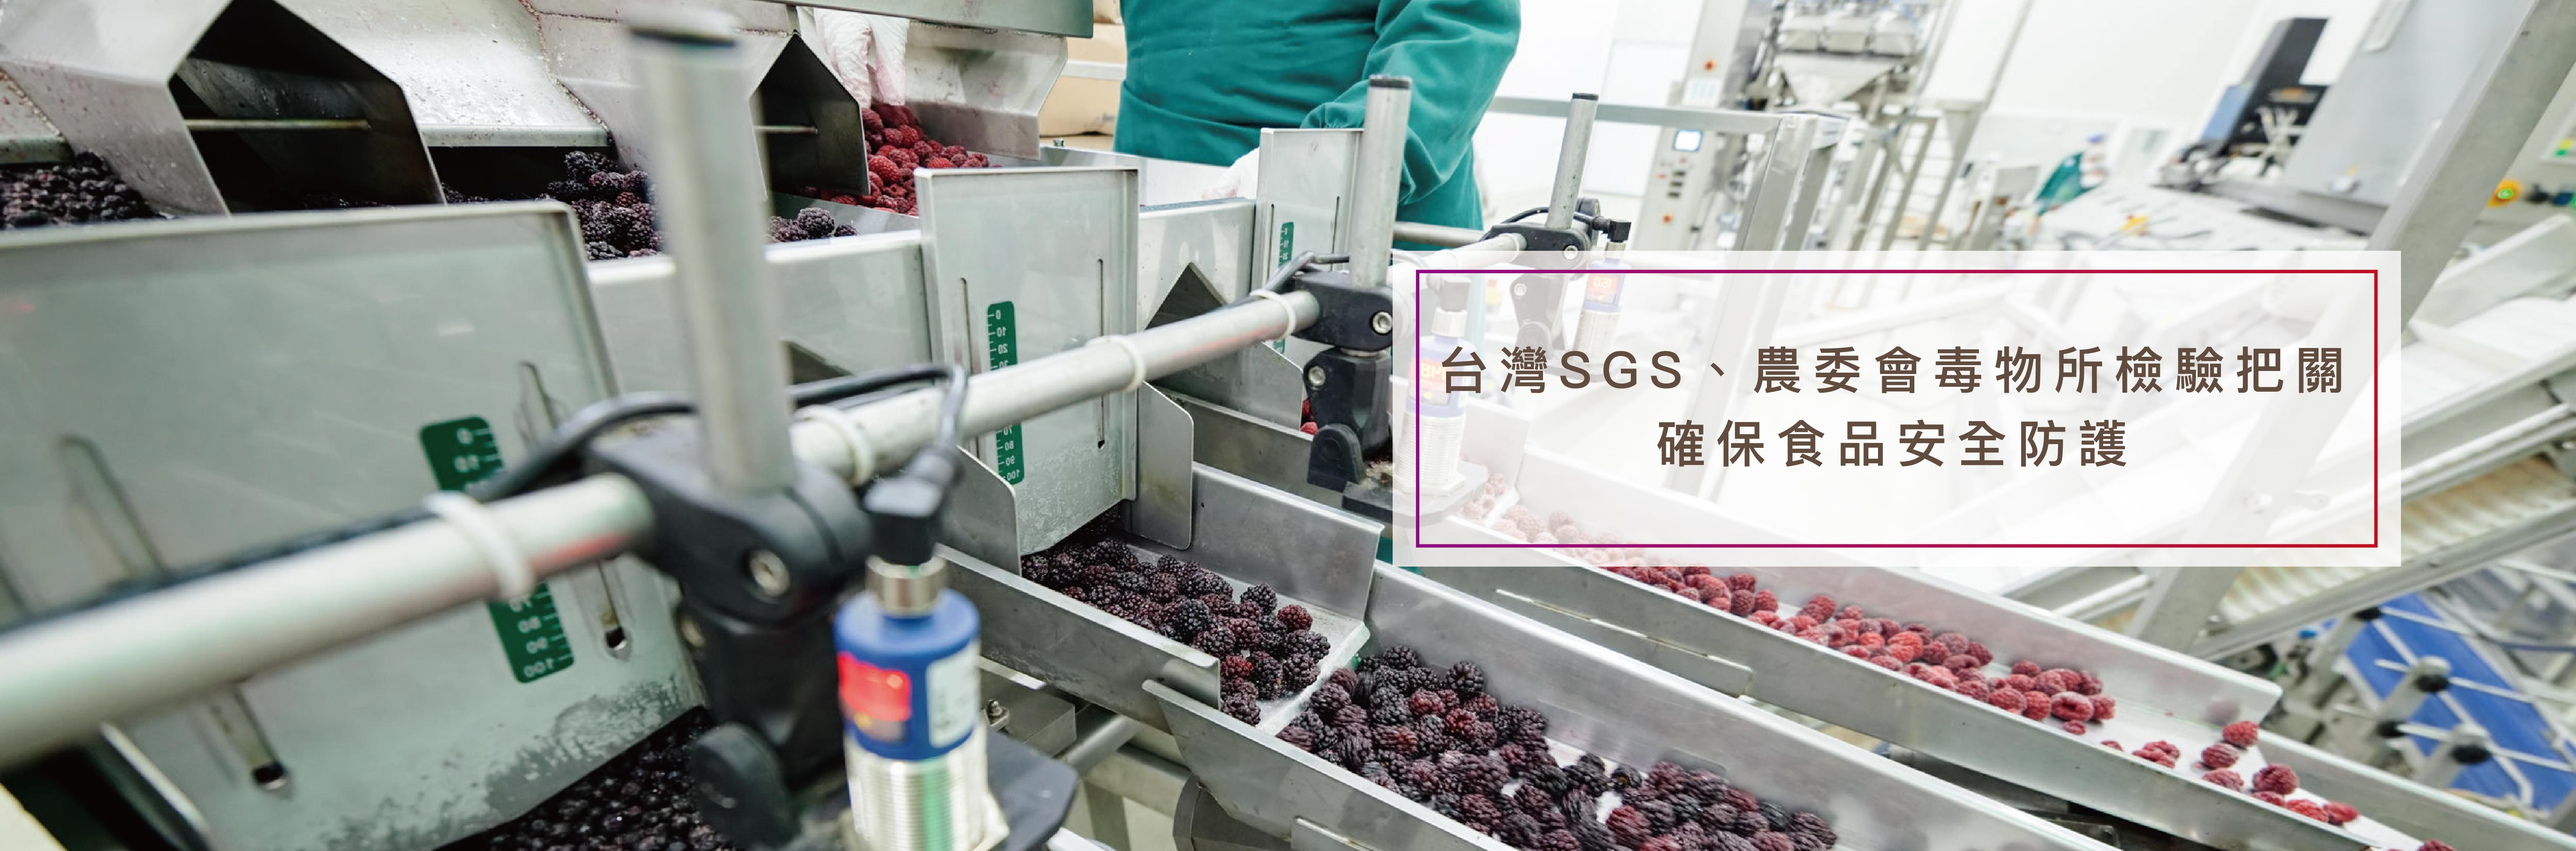 SGS農委會毒物所檢驗把關_確保食品安全防護